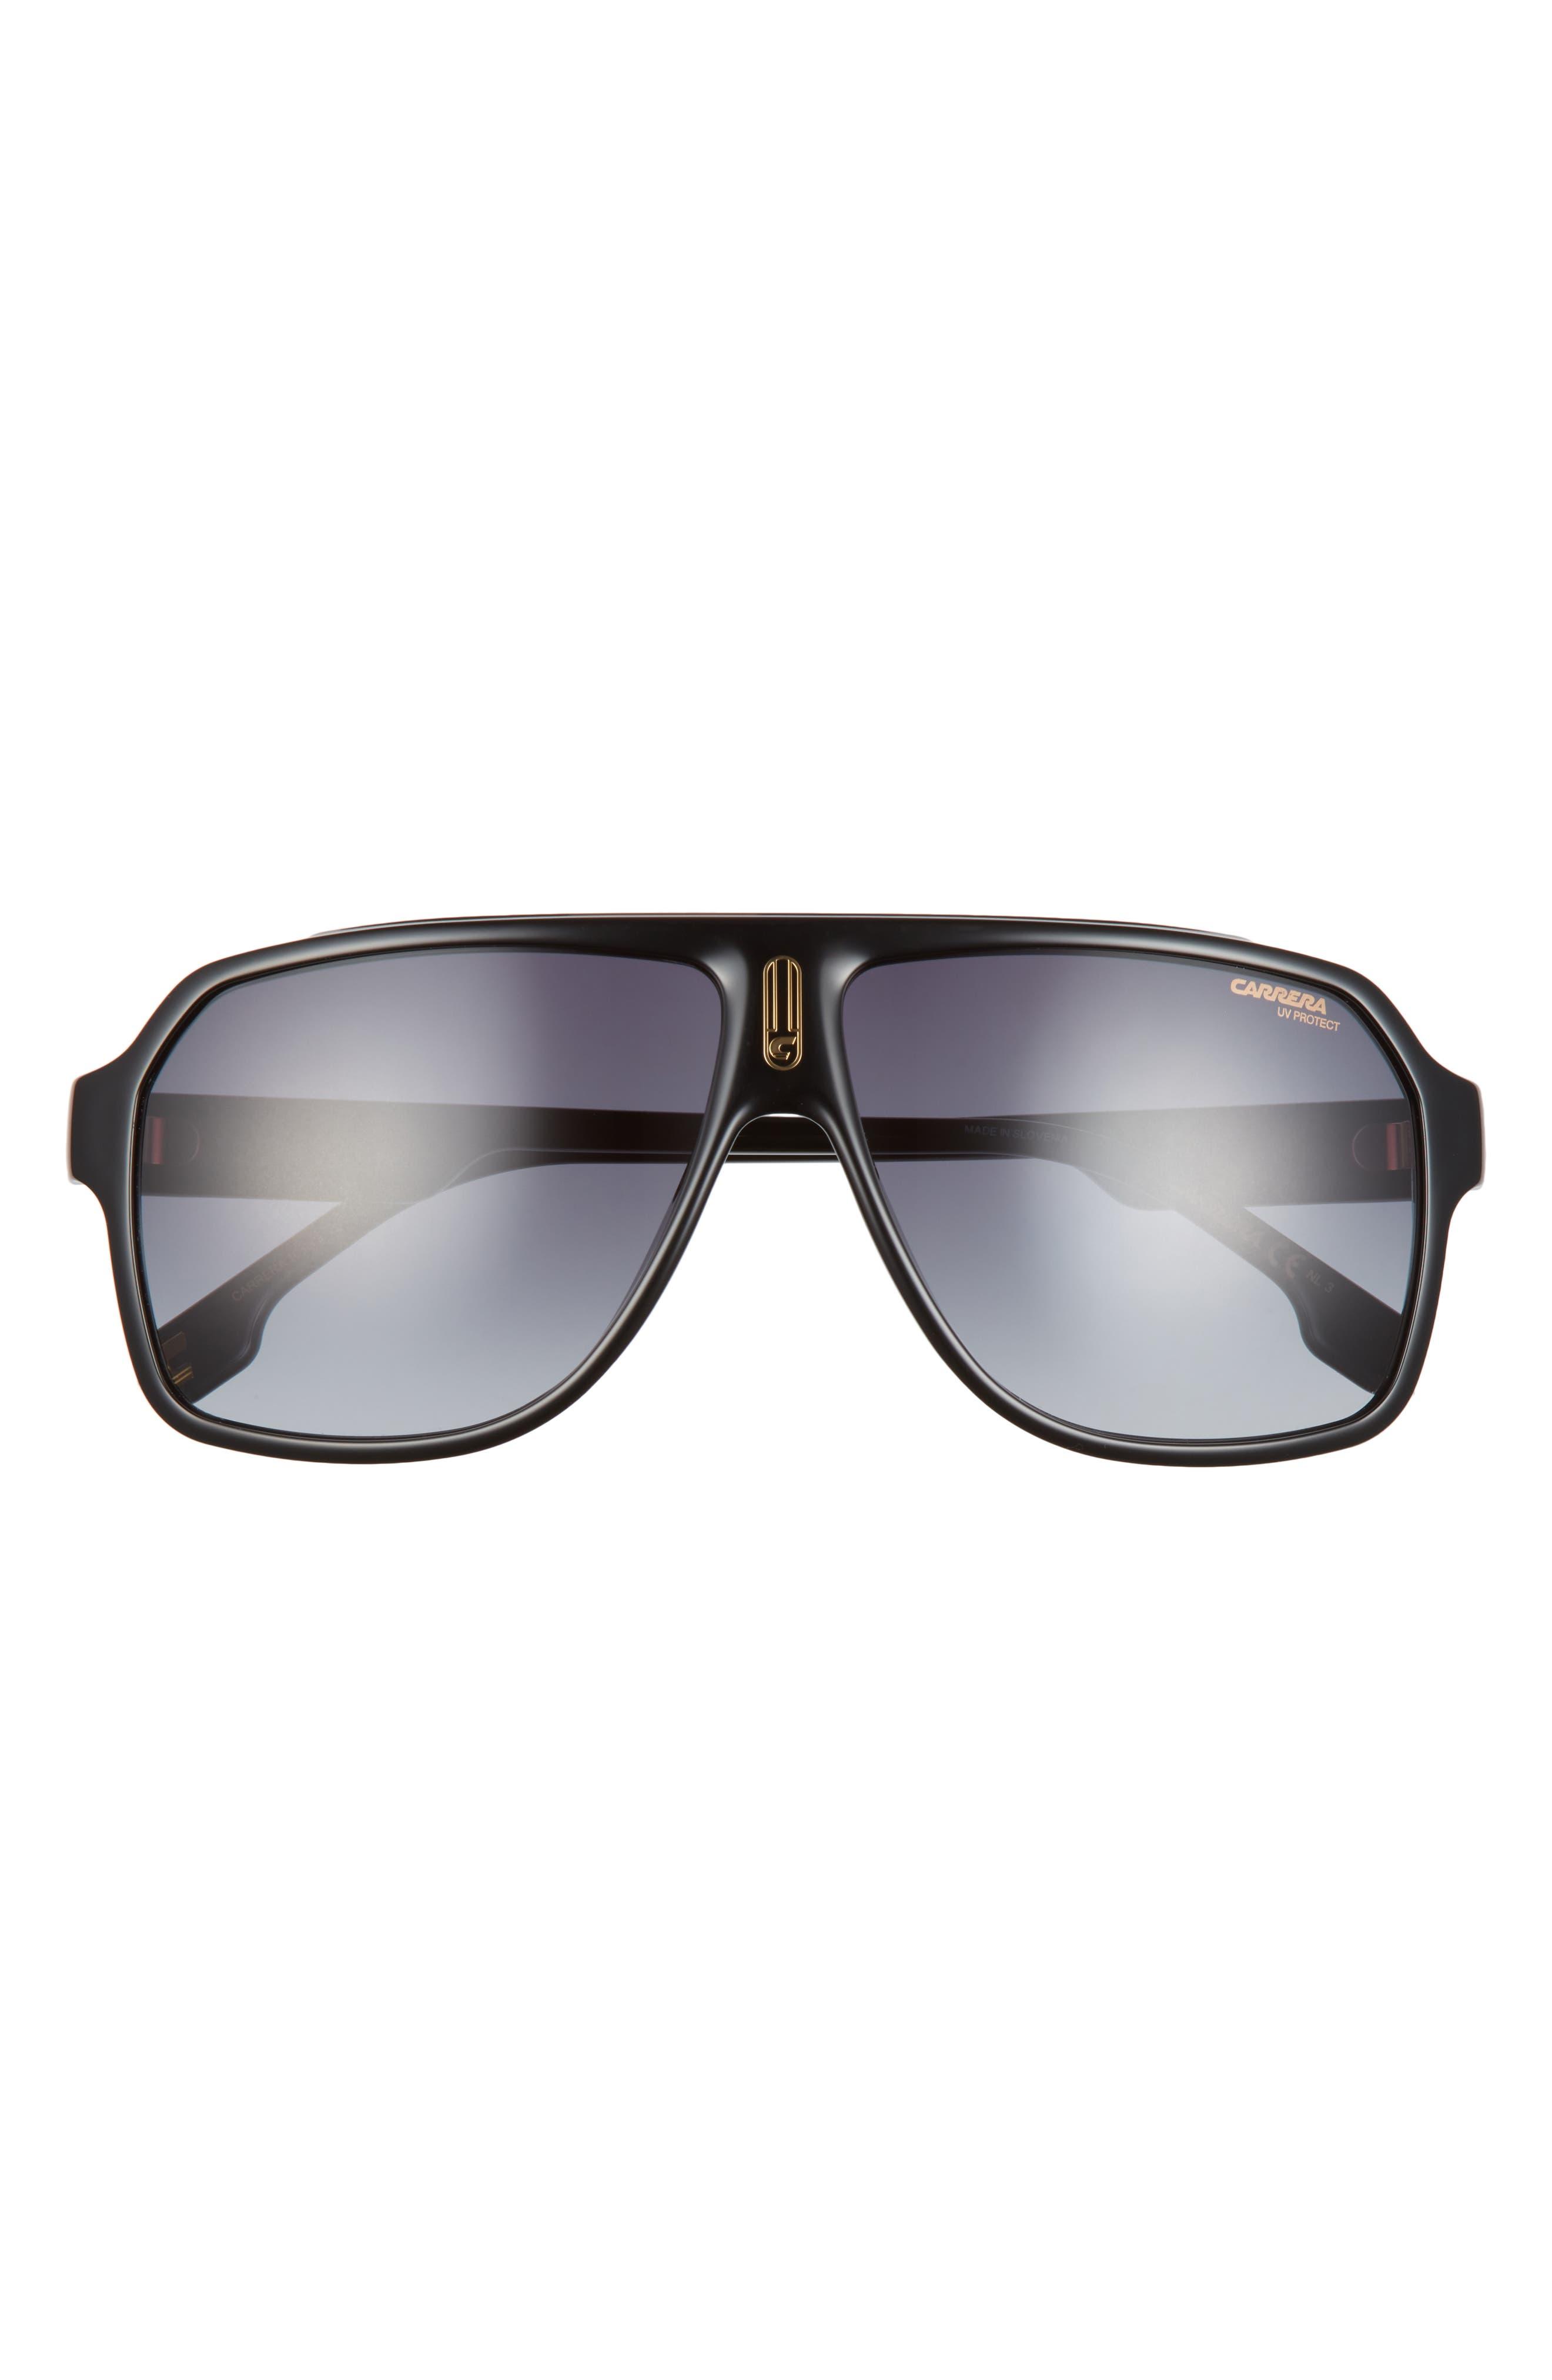 62mm Oversize Rectangle Aviator Sunglasses